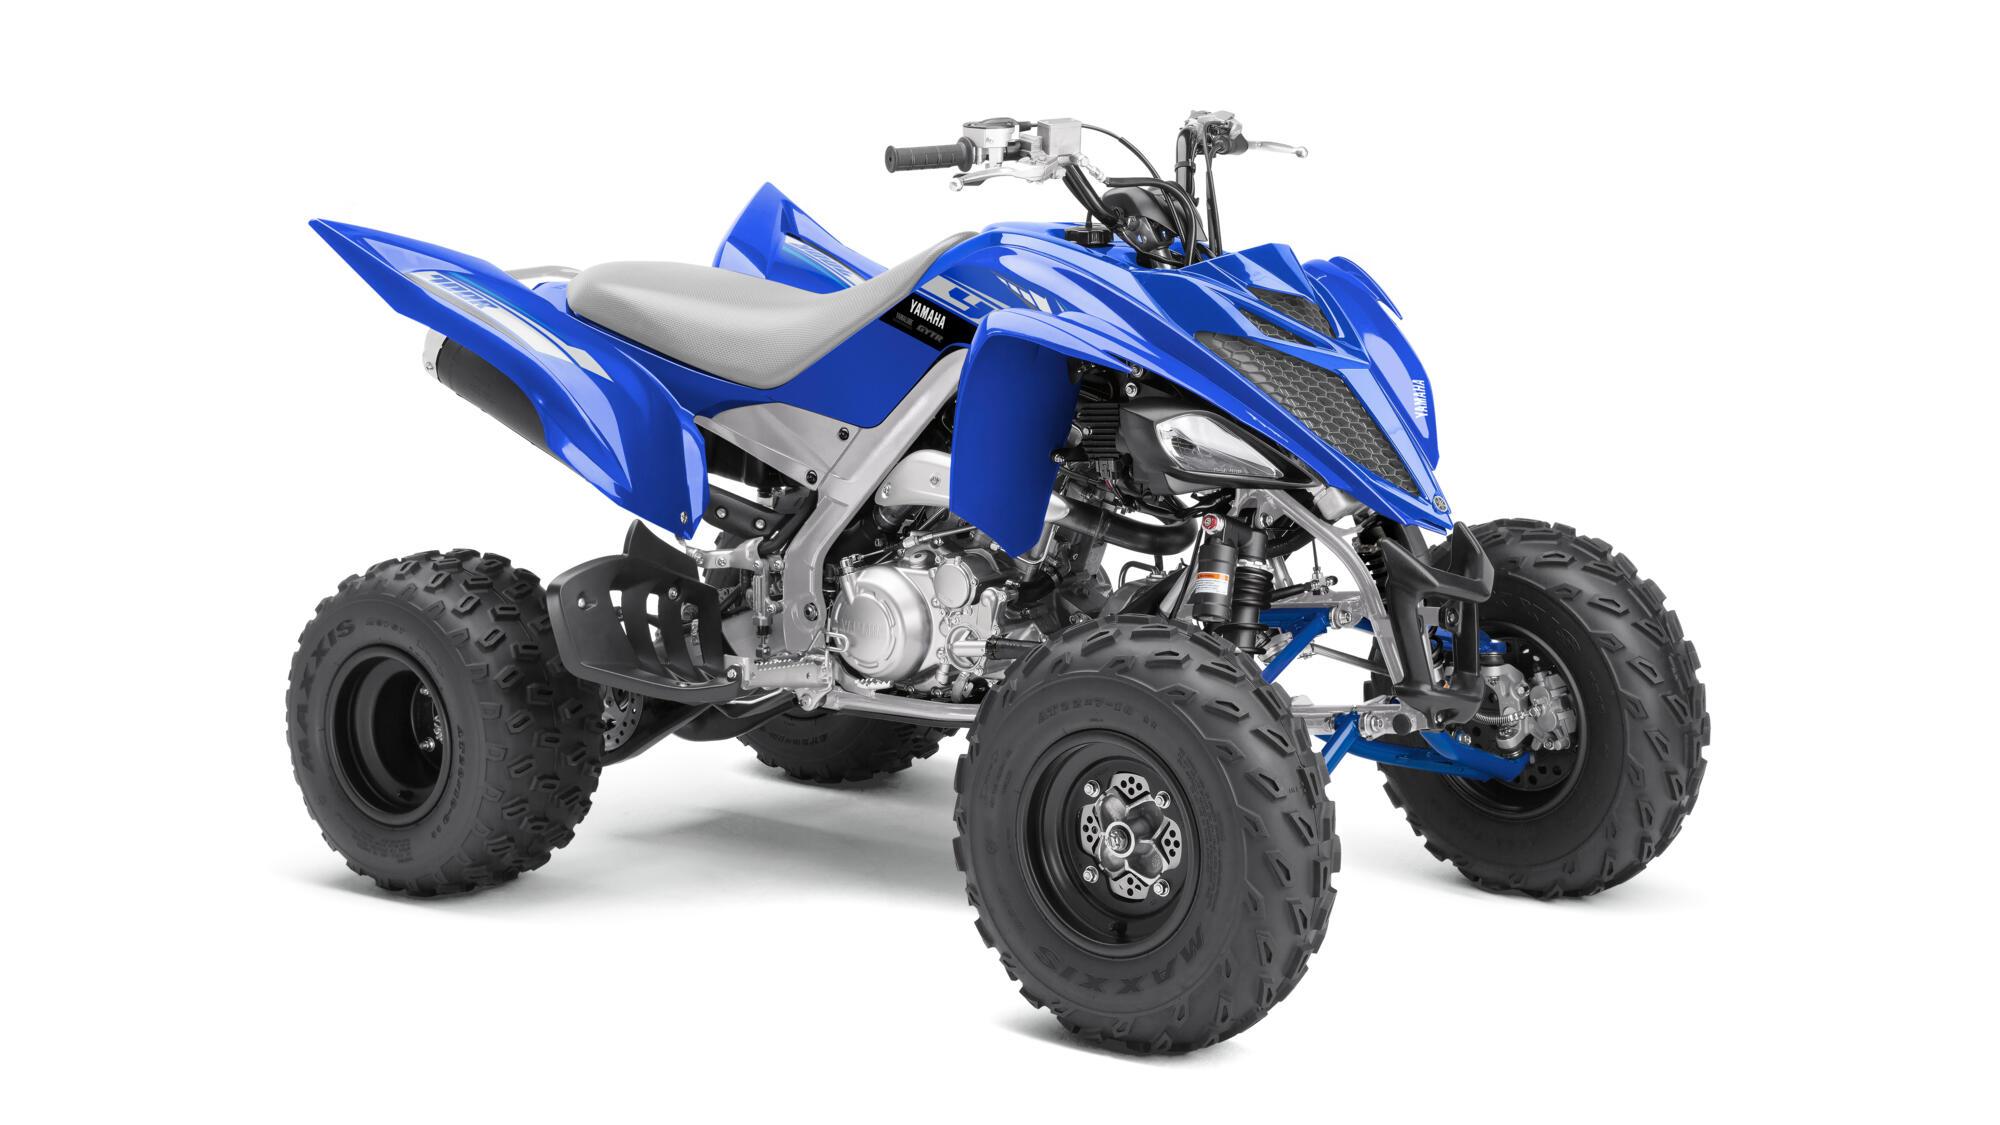 Yamaha YFM700R | MotorCentrumWest